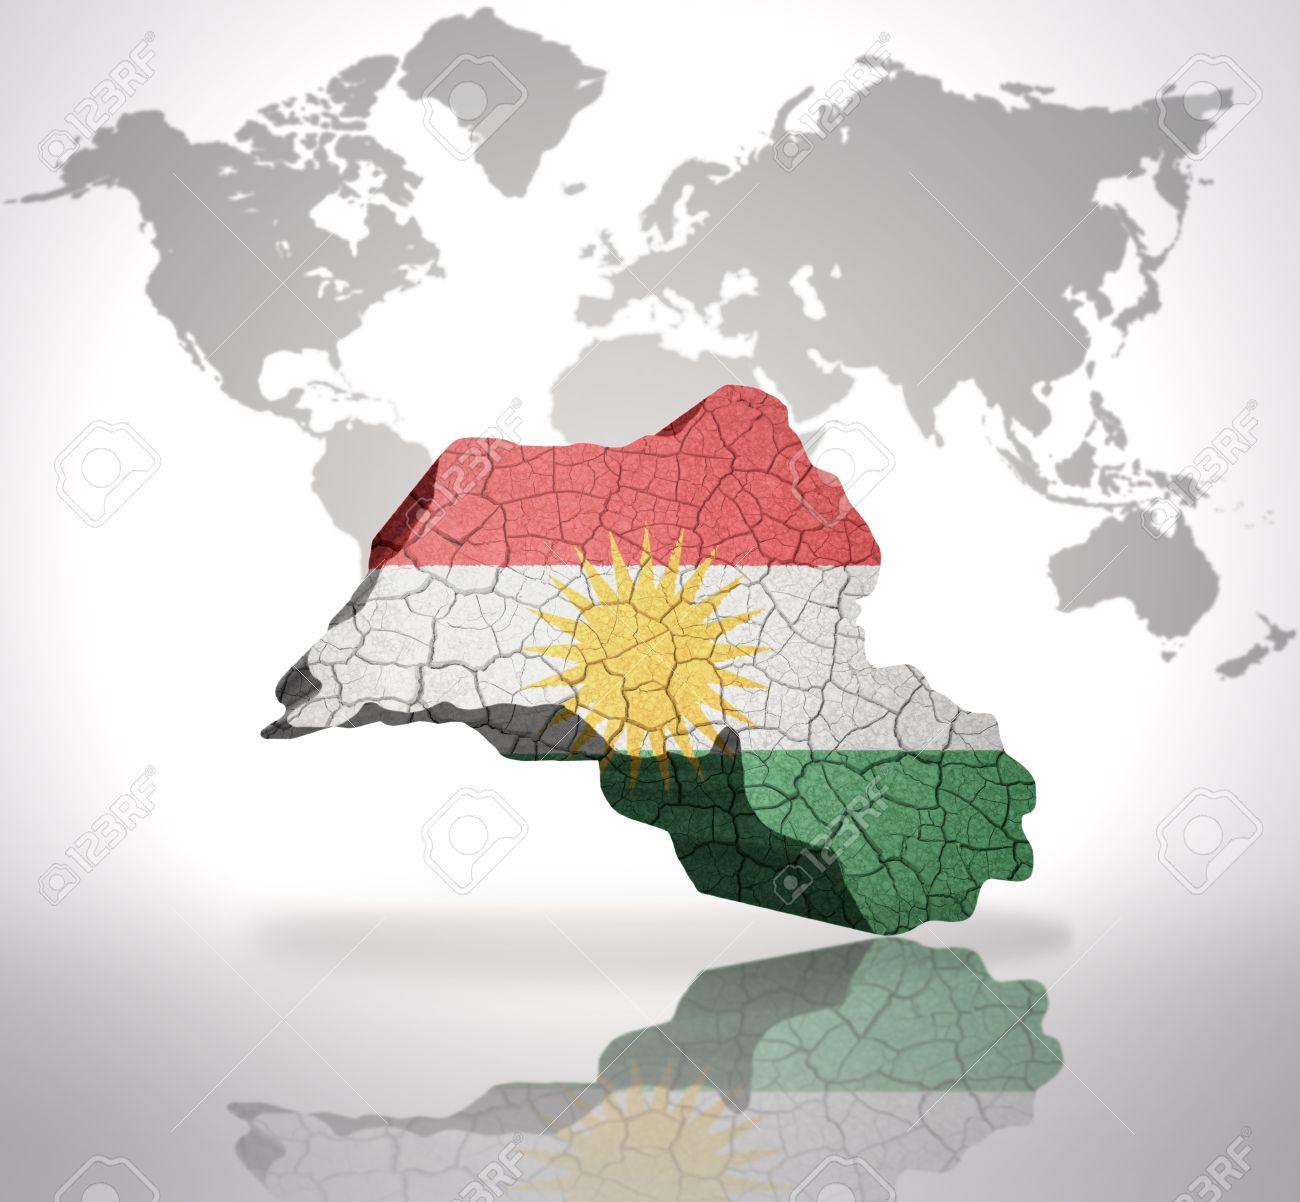 Map of kurdistan with kurdish flag on a world map background stock map of kurdistan with kurdish flag on a world map background stock photo 34872886 gumiabroncs Choice Image